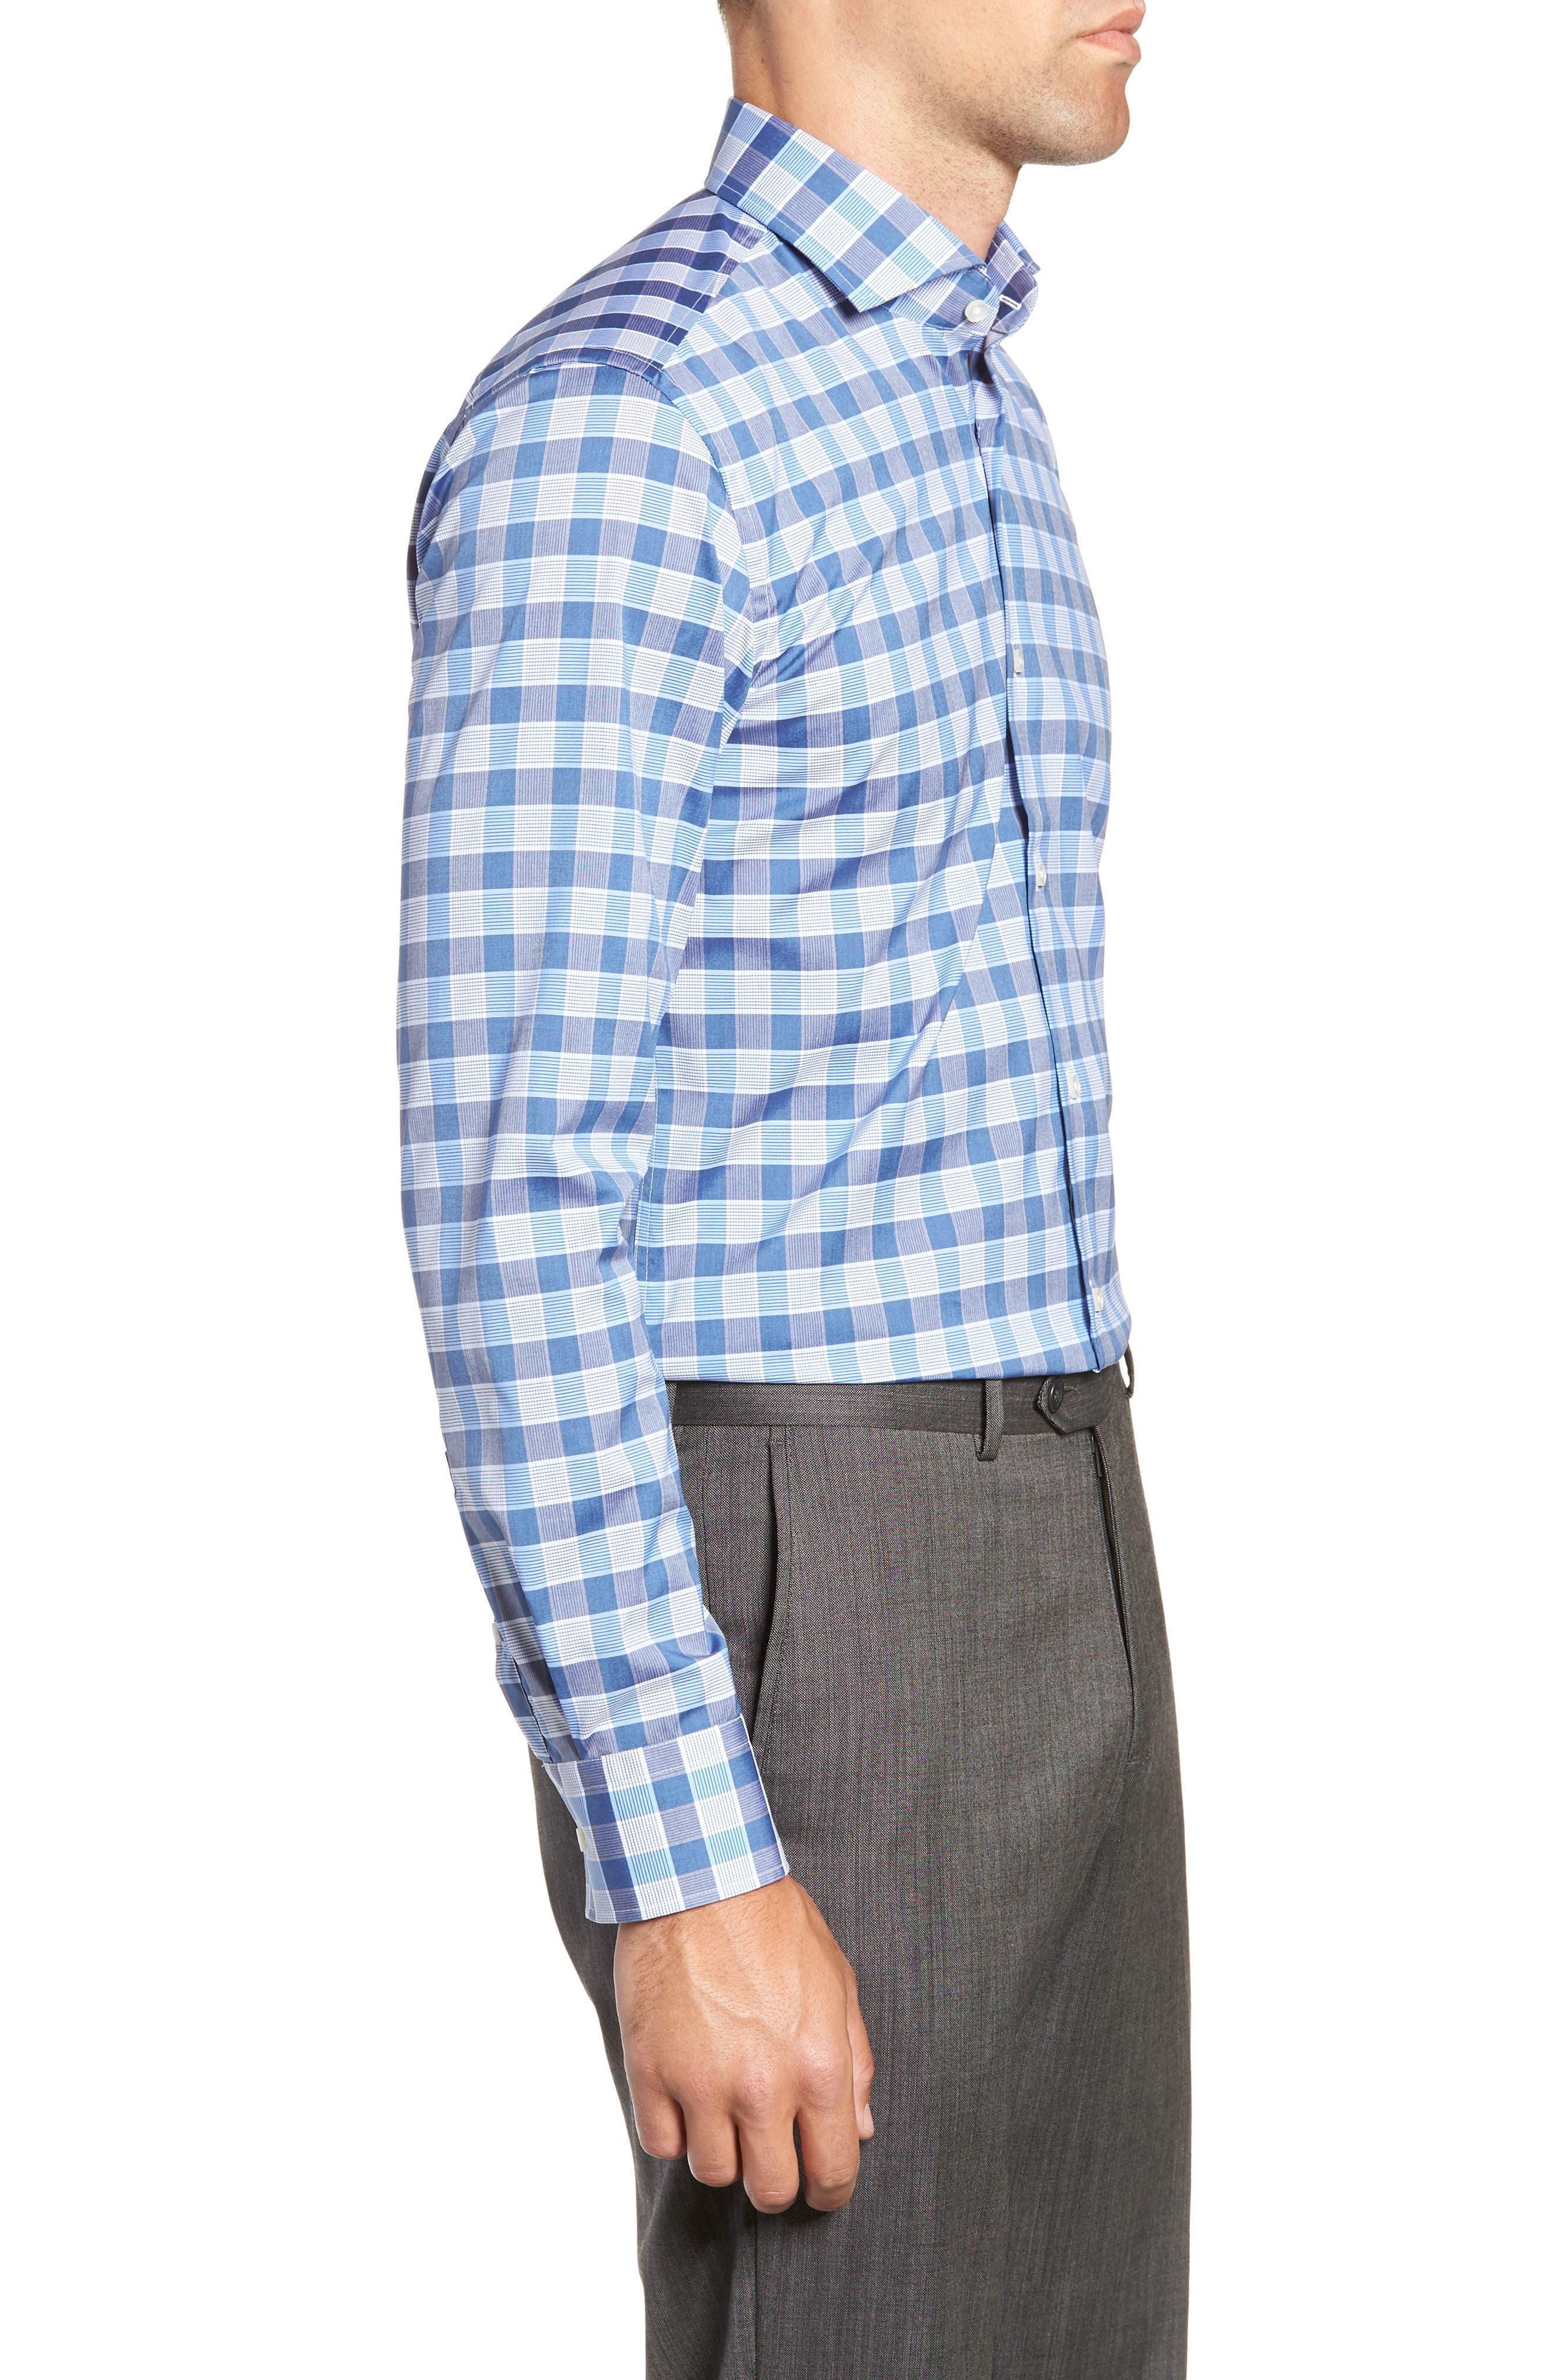 Jason Slim Fit Plaid Dress Shirt,                             Alternate thumbnail 4, color,                             BLUE